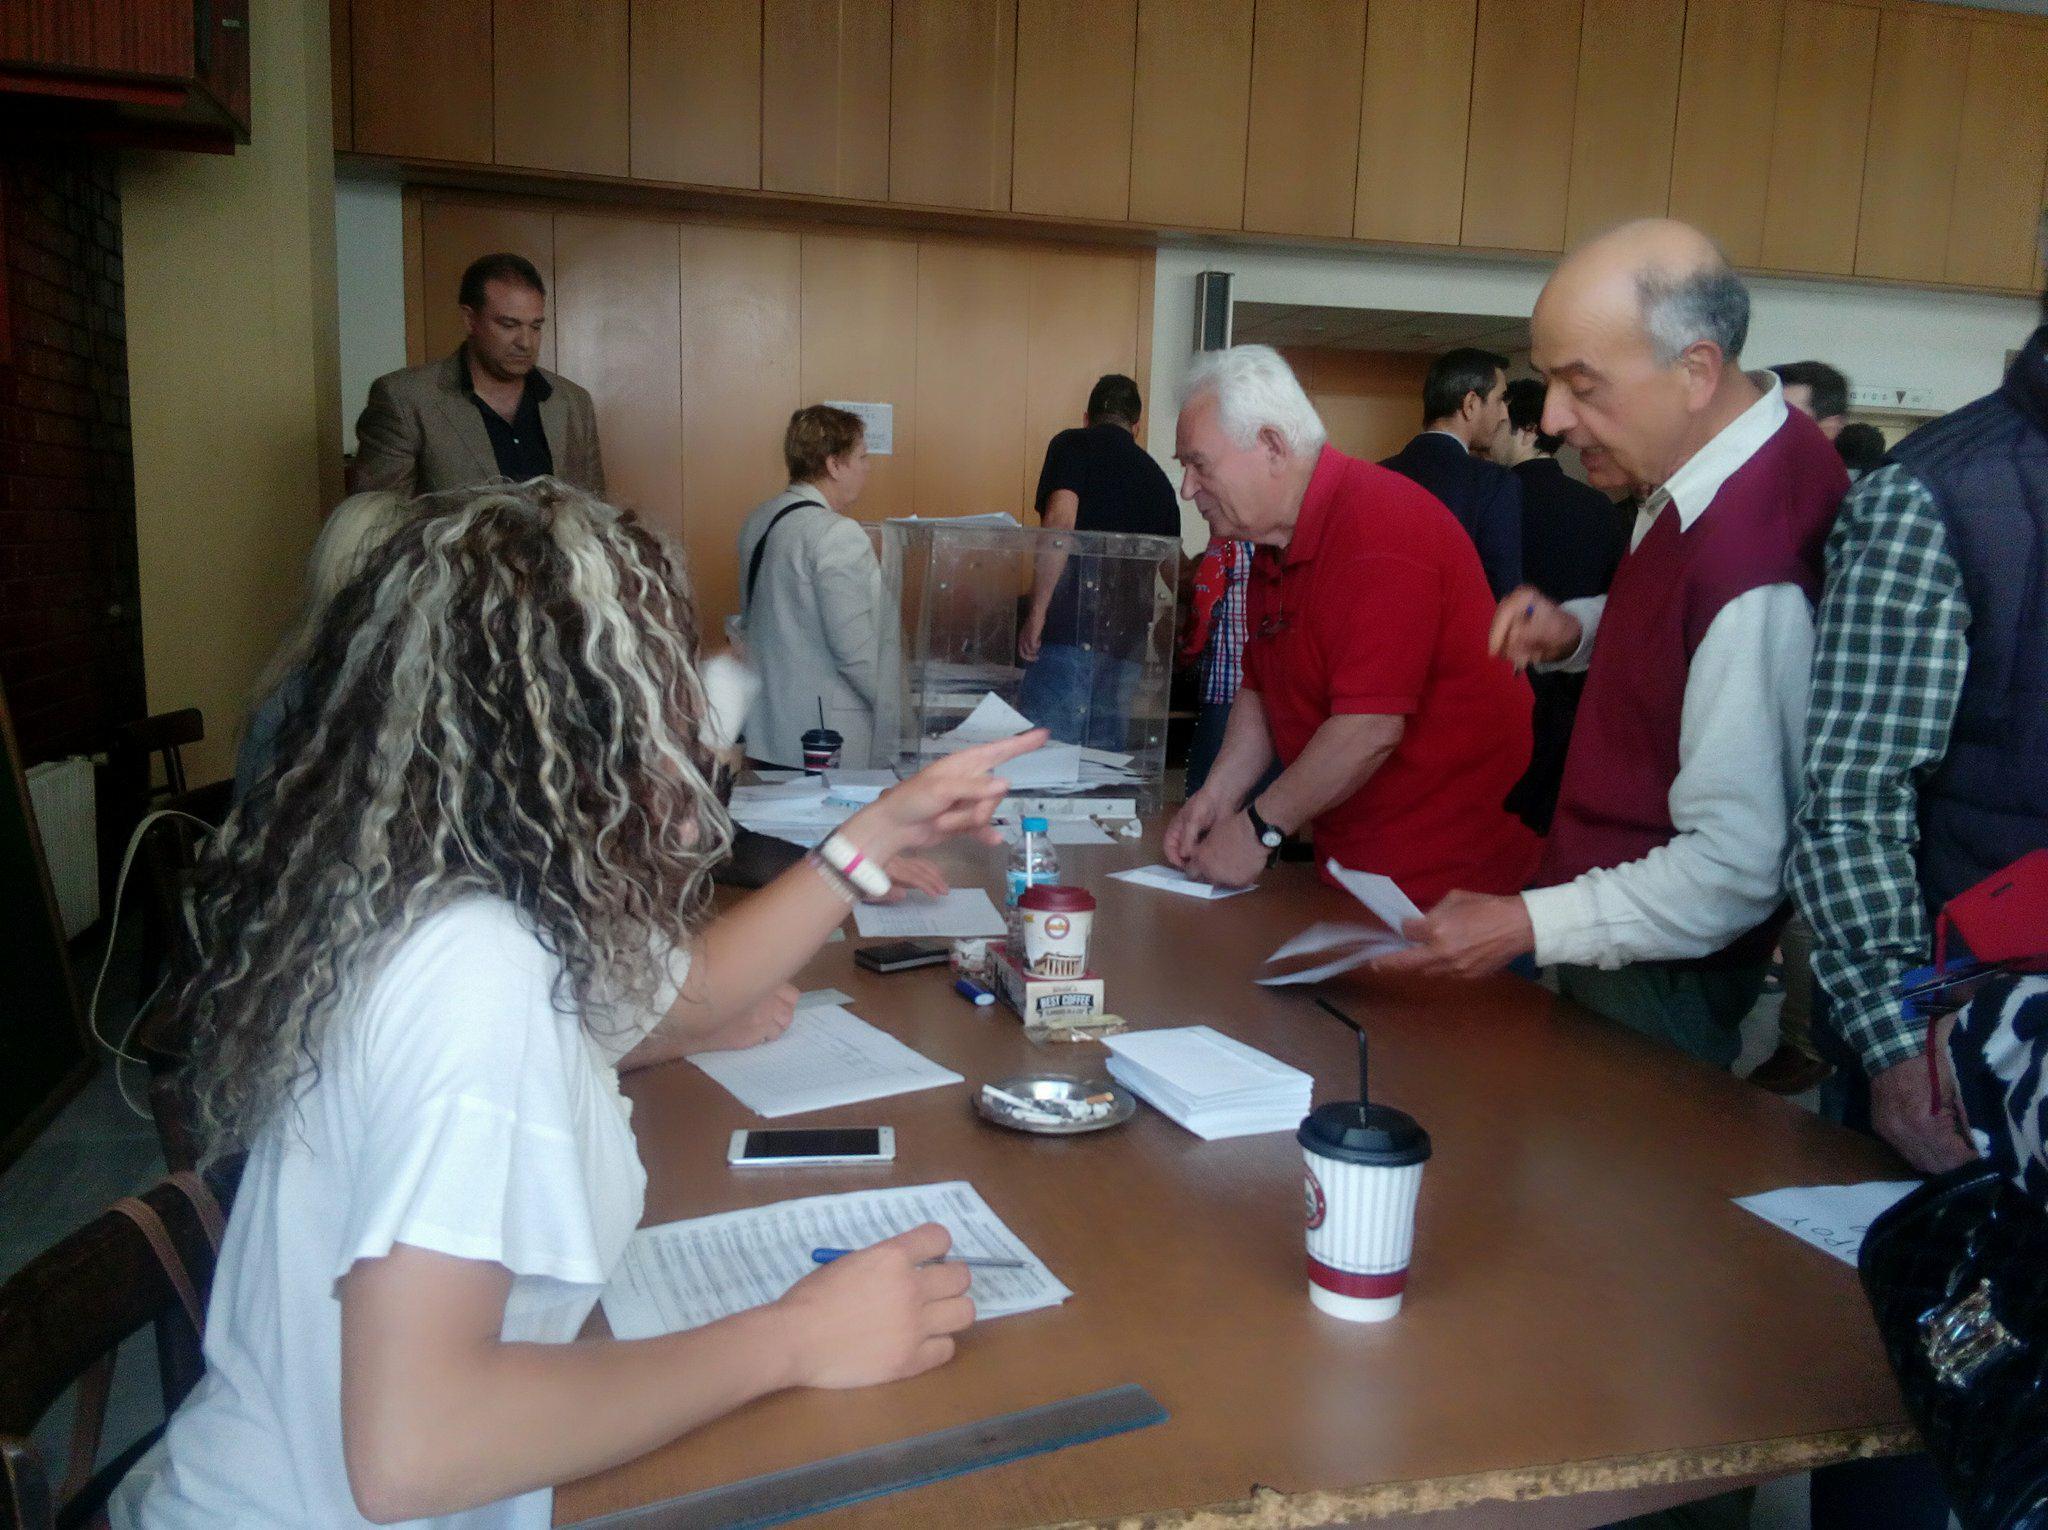 Eνταση στις εκλογές της ΝΔ- 20 ΡΟΜΑ επιχείρησαν να ψηφίσουν με σταυρωμένα ψηφοδέλτια